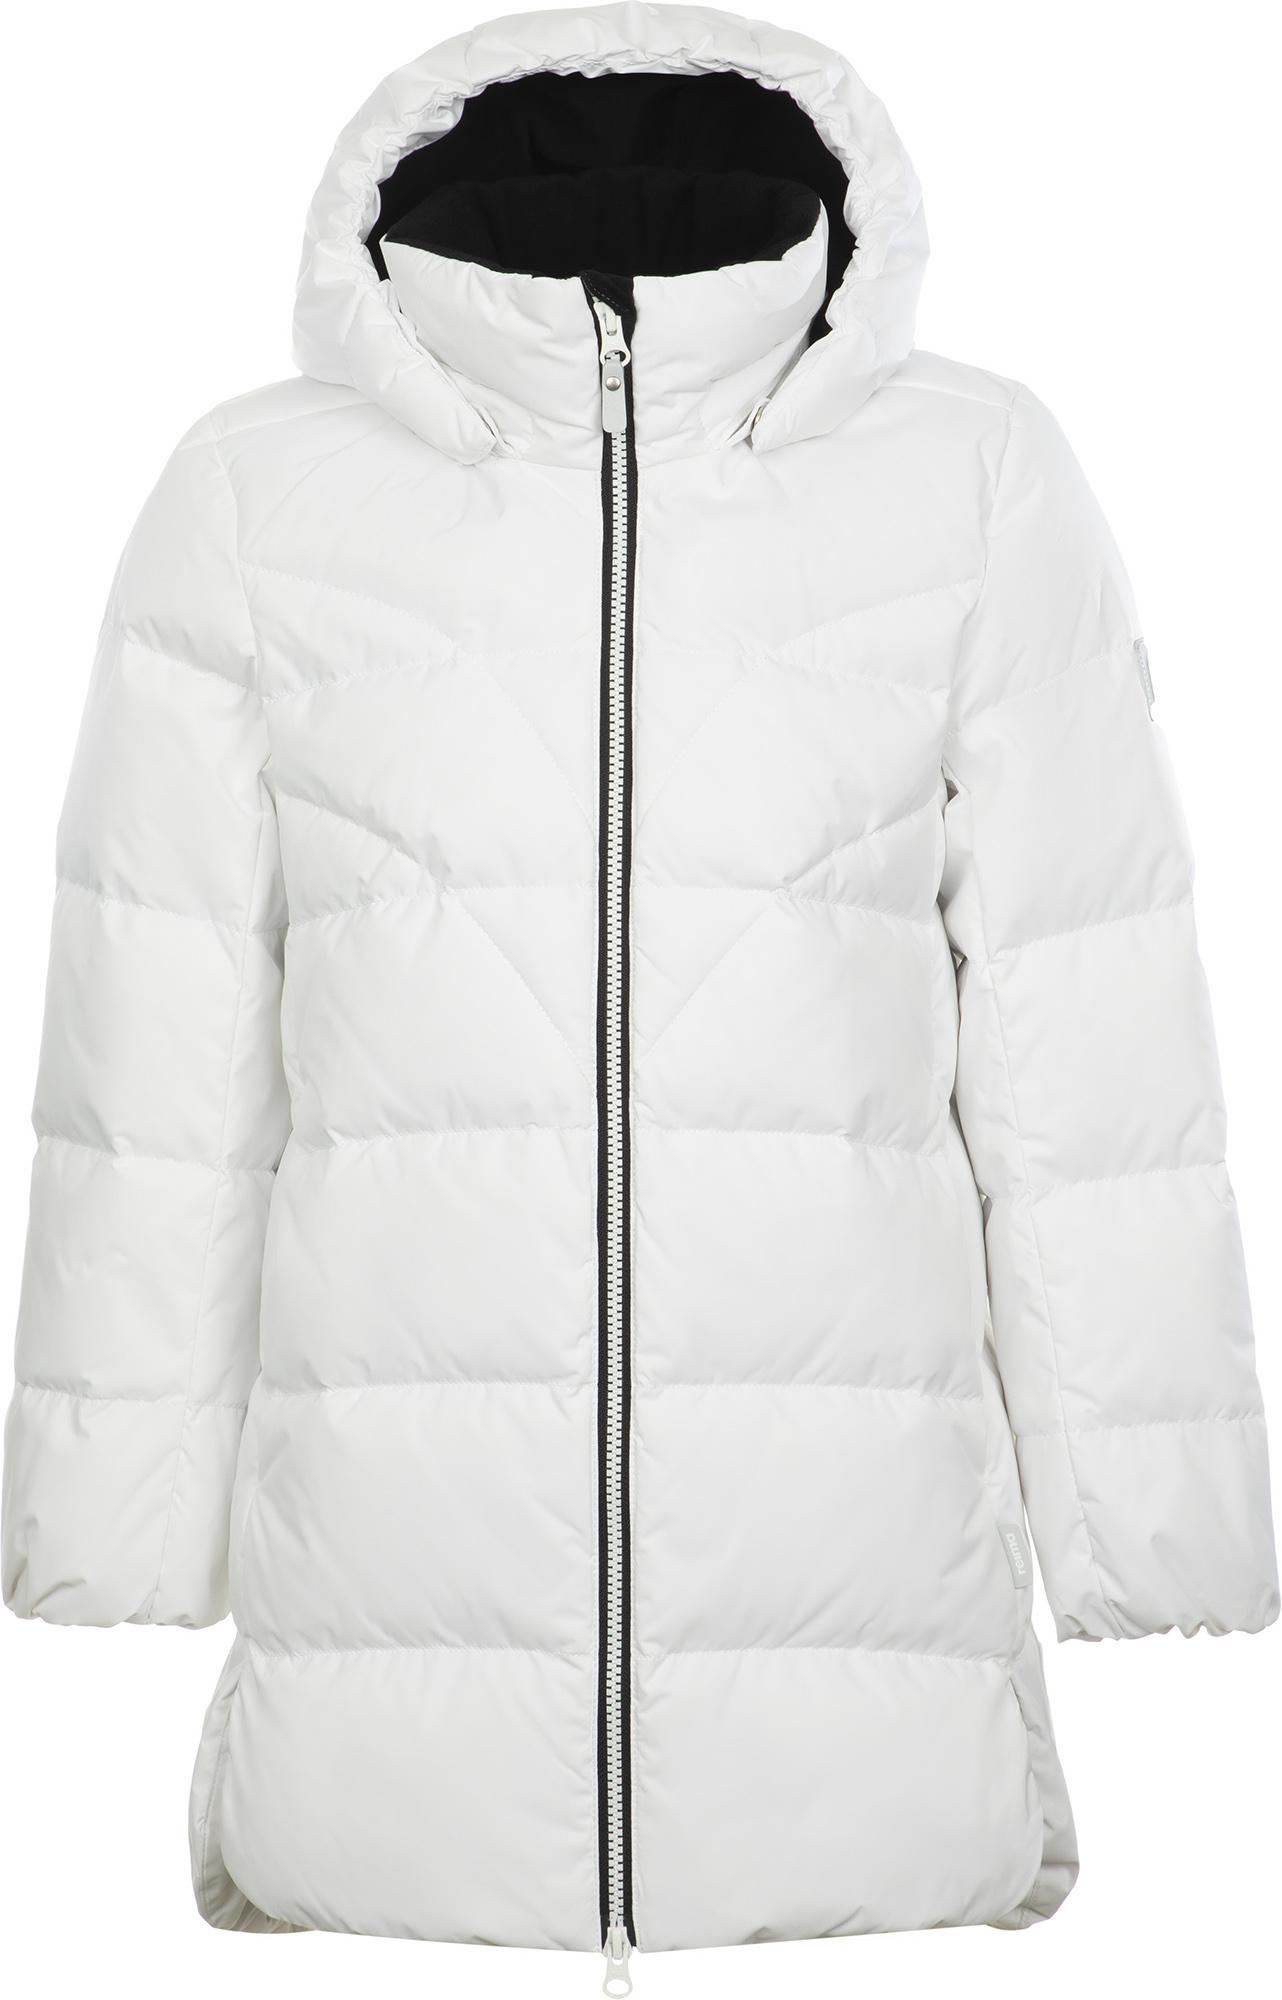 Reima Пуховик для девочек Reima Ahde, размер 128 куртка lassie by reima 721654 размер 128 см цвет 3511